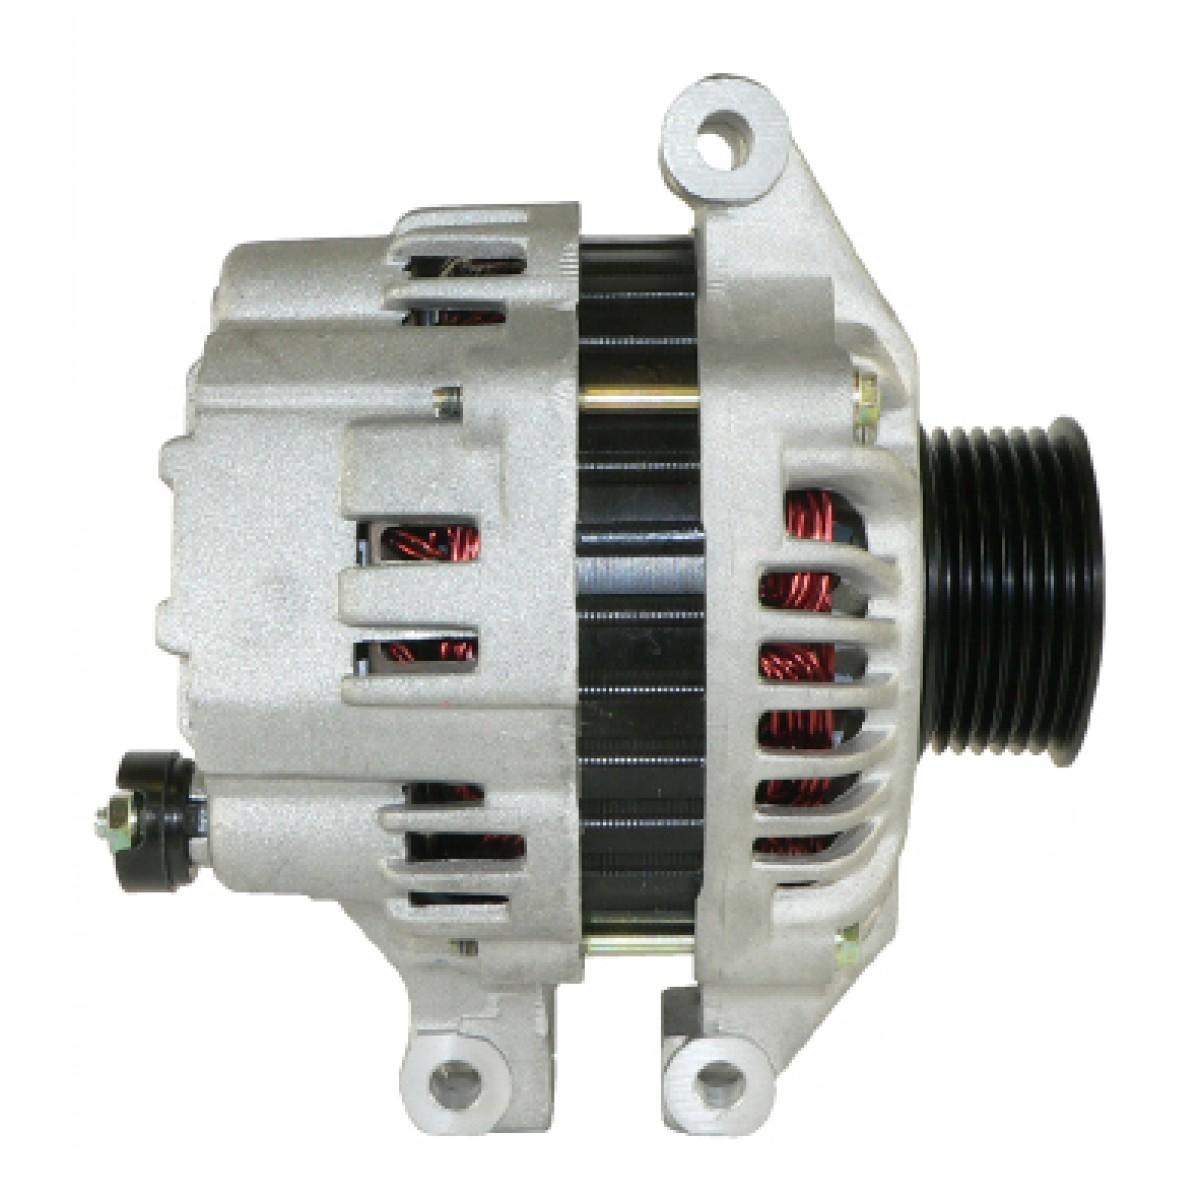 New MITSUBISHI Alternator For ACURA RSX 2006